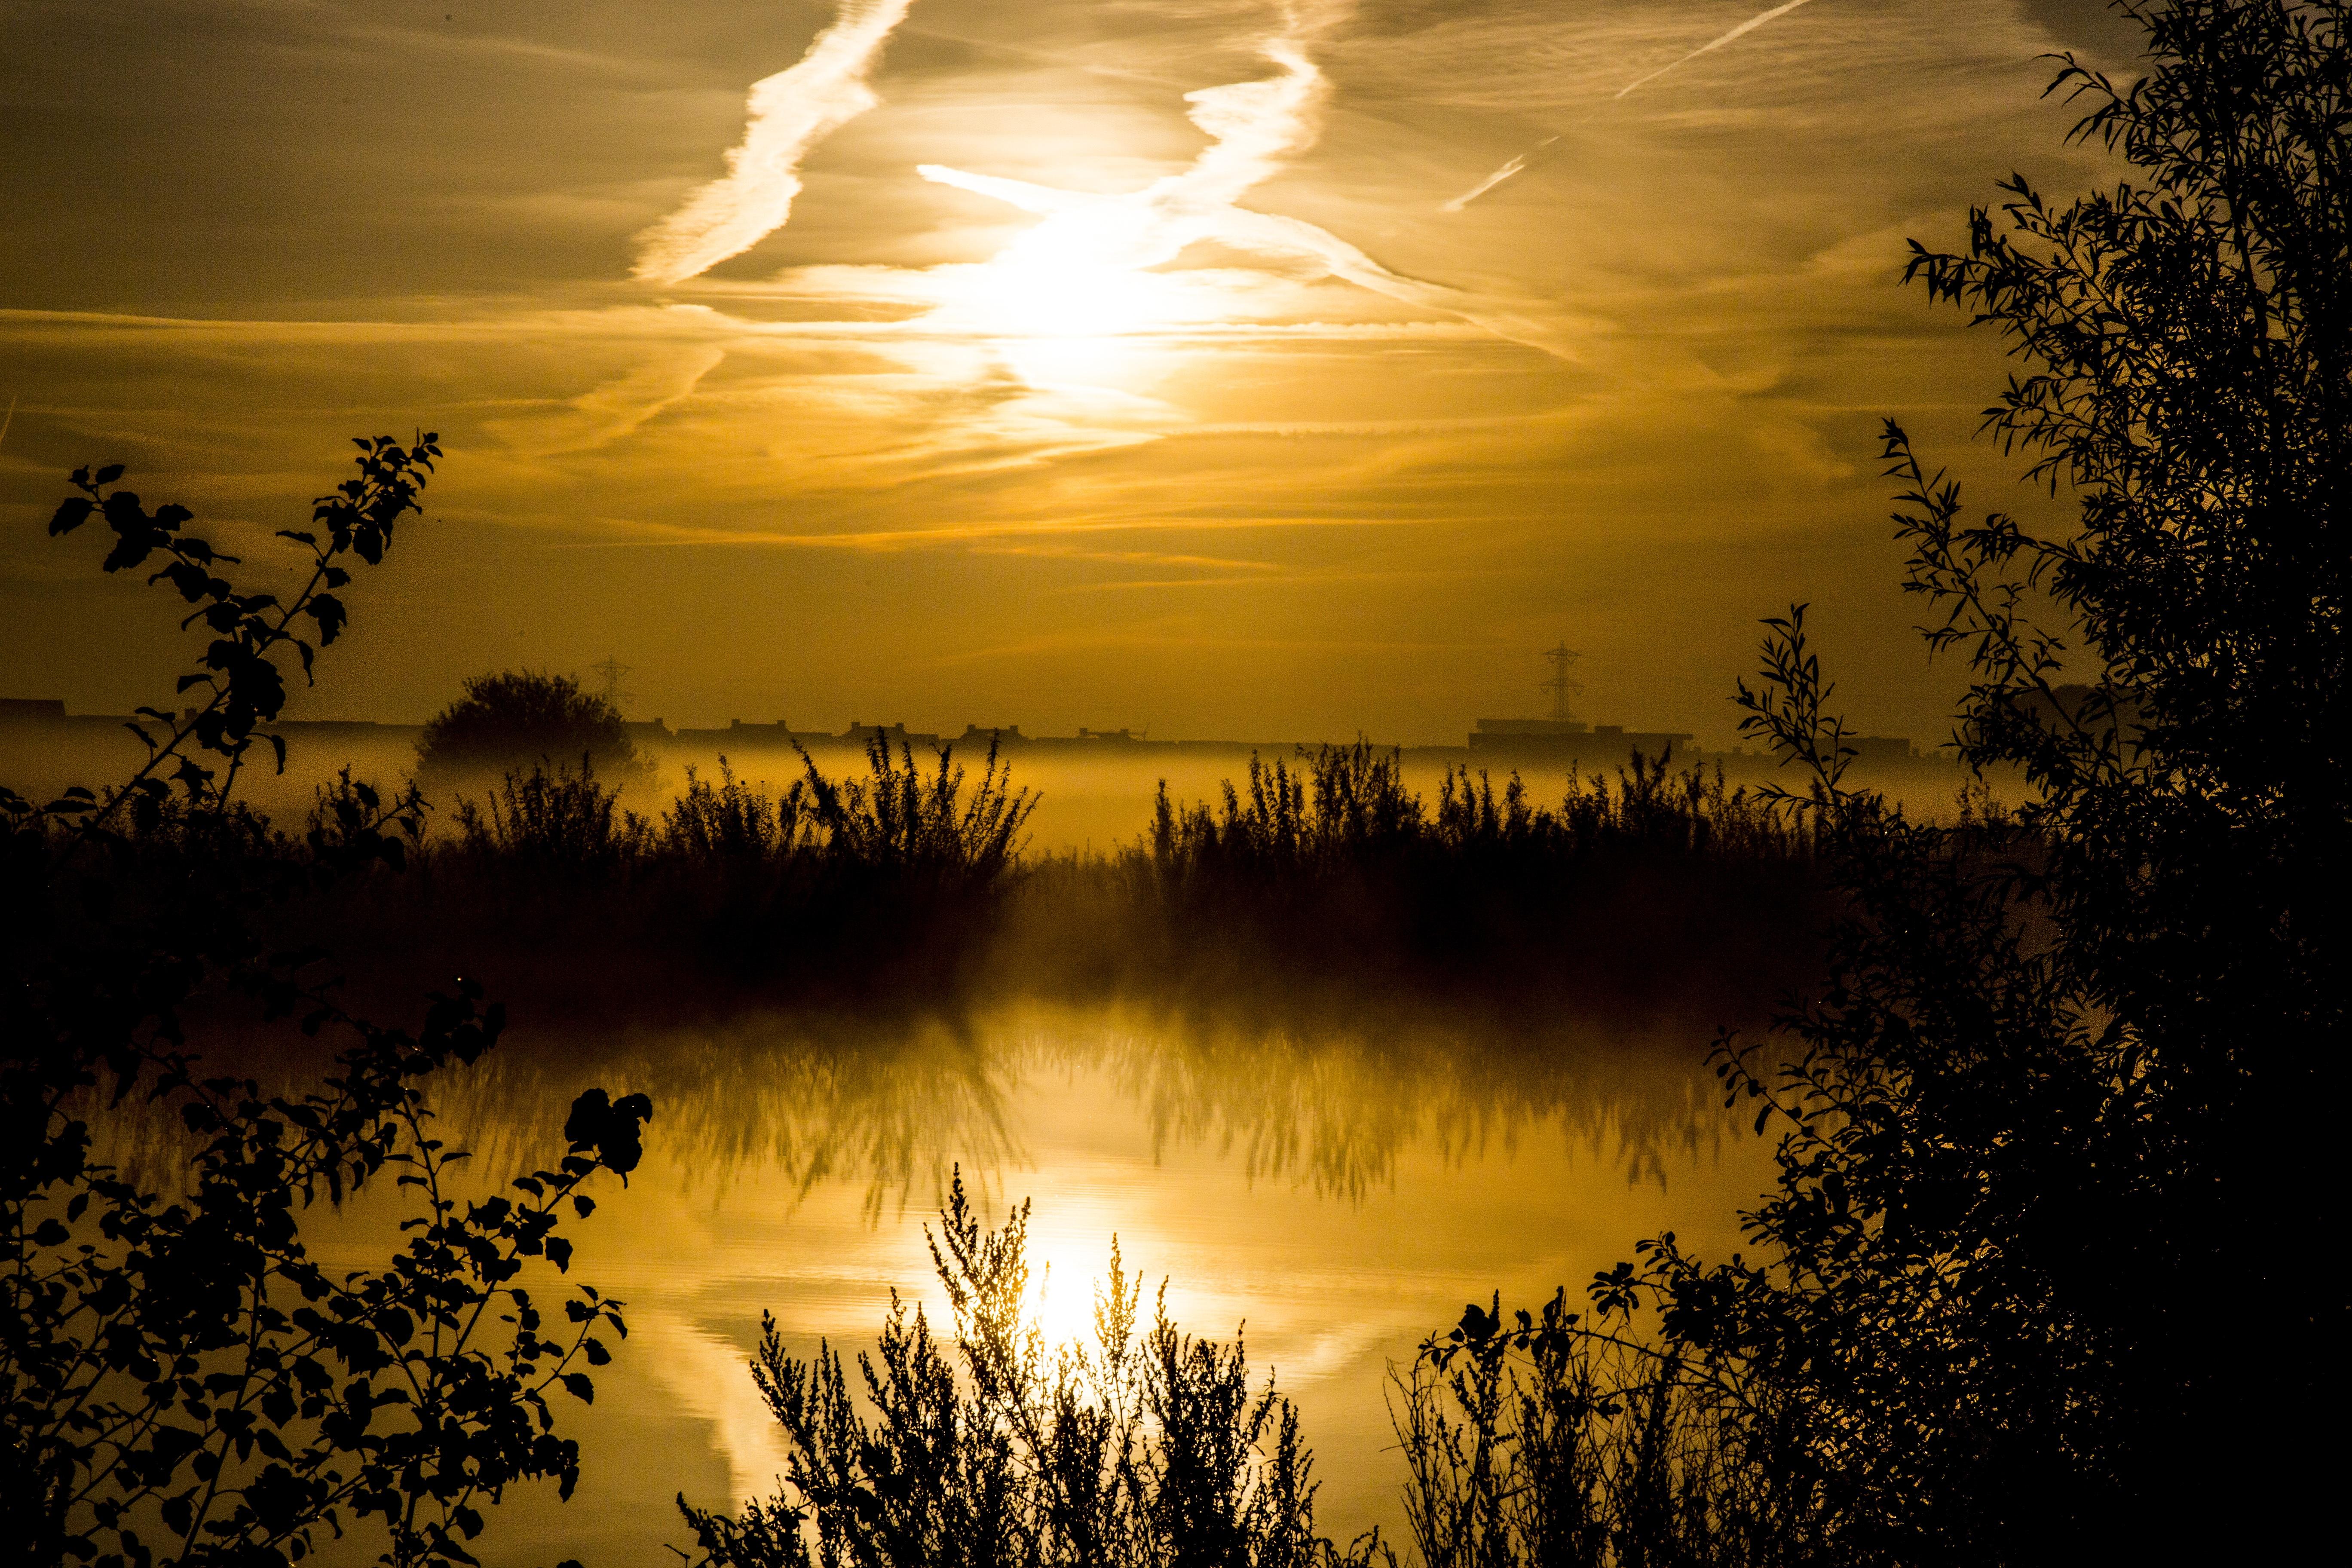 Free Images : landscape, tree, nature, branch, cloud ...